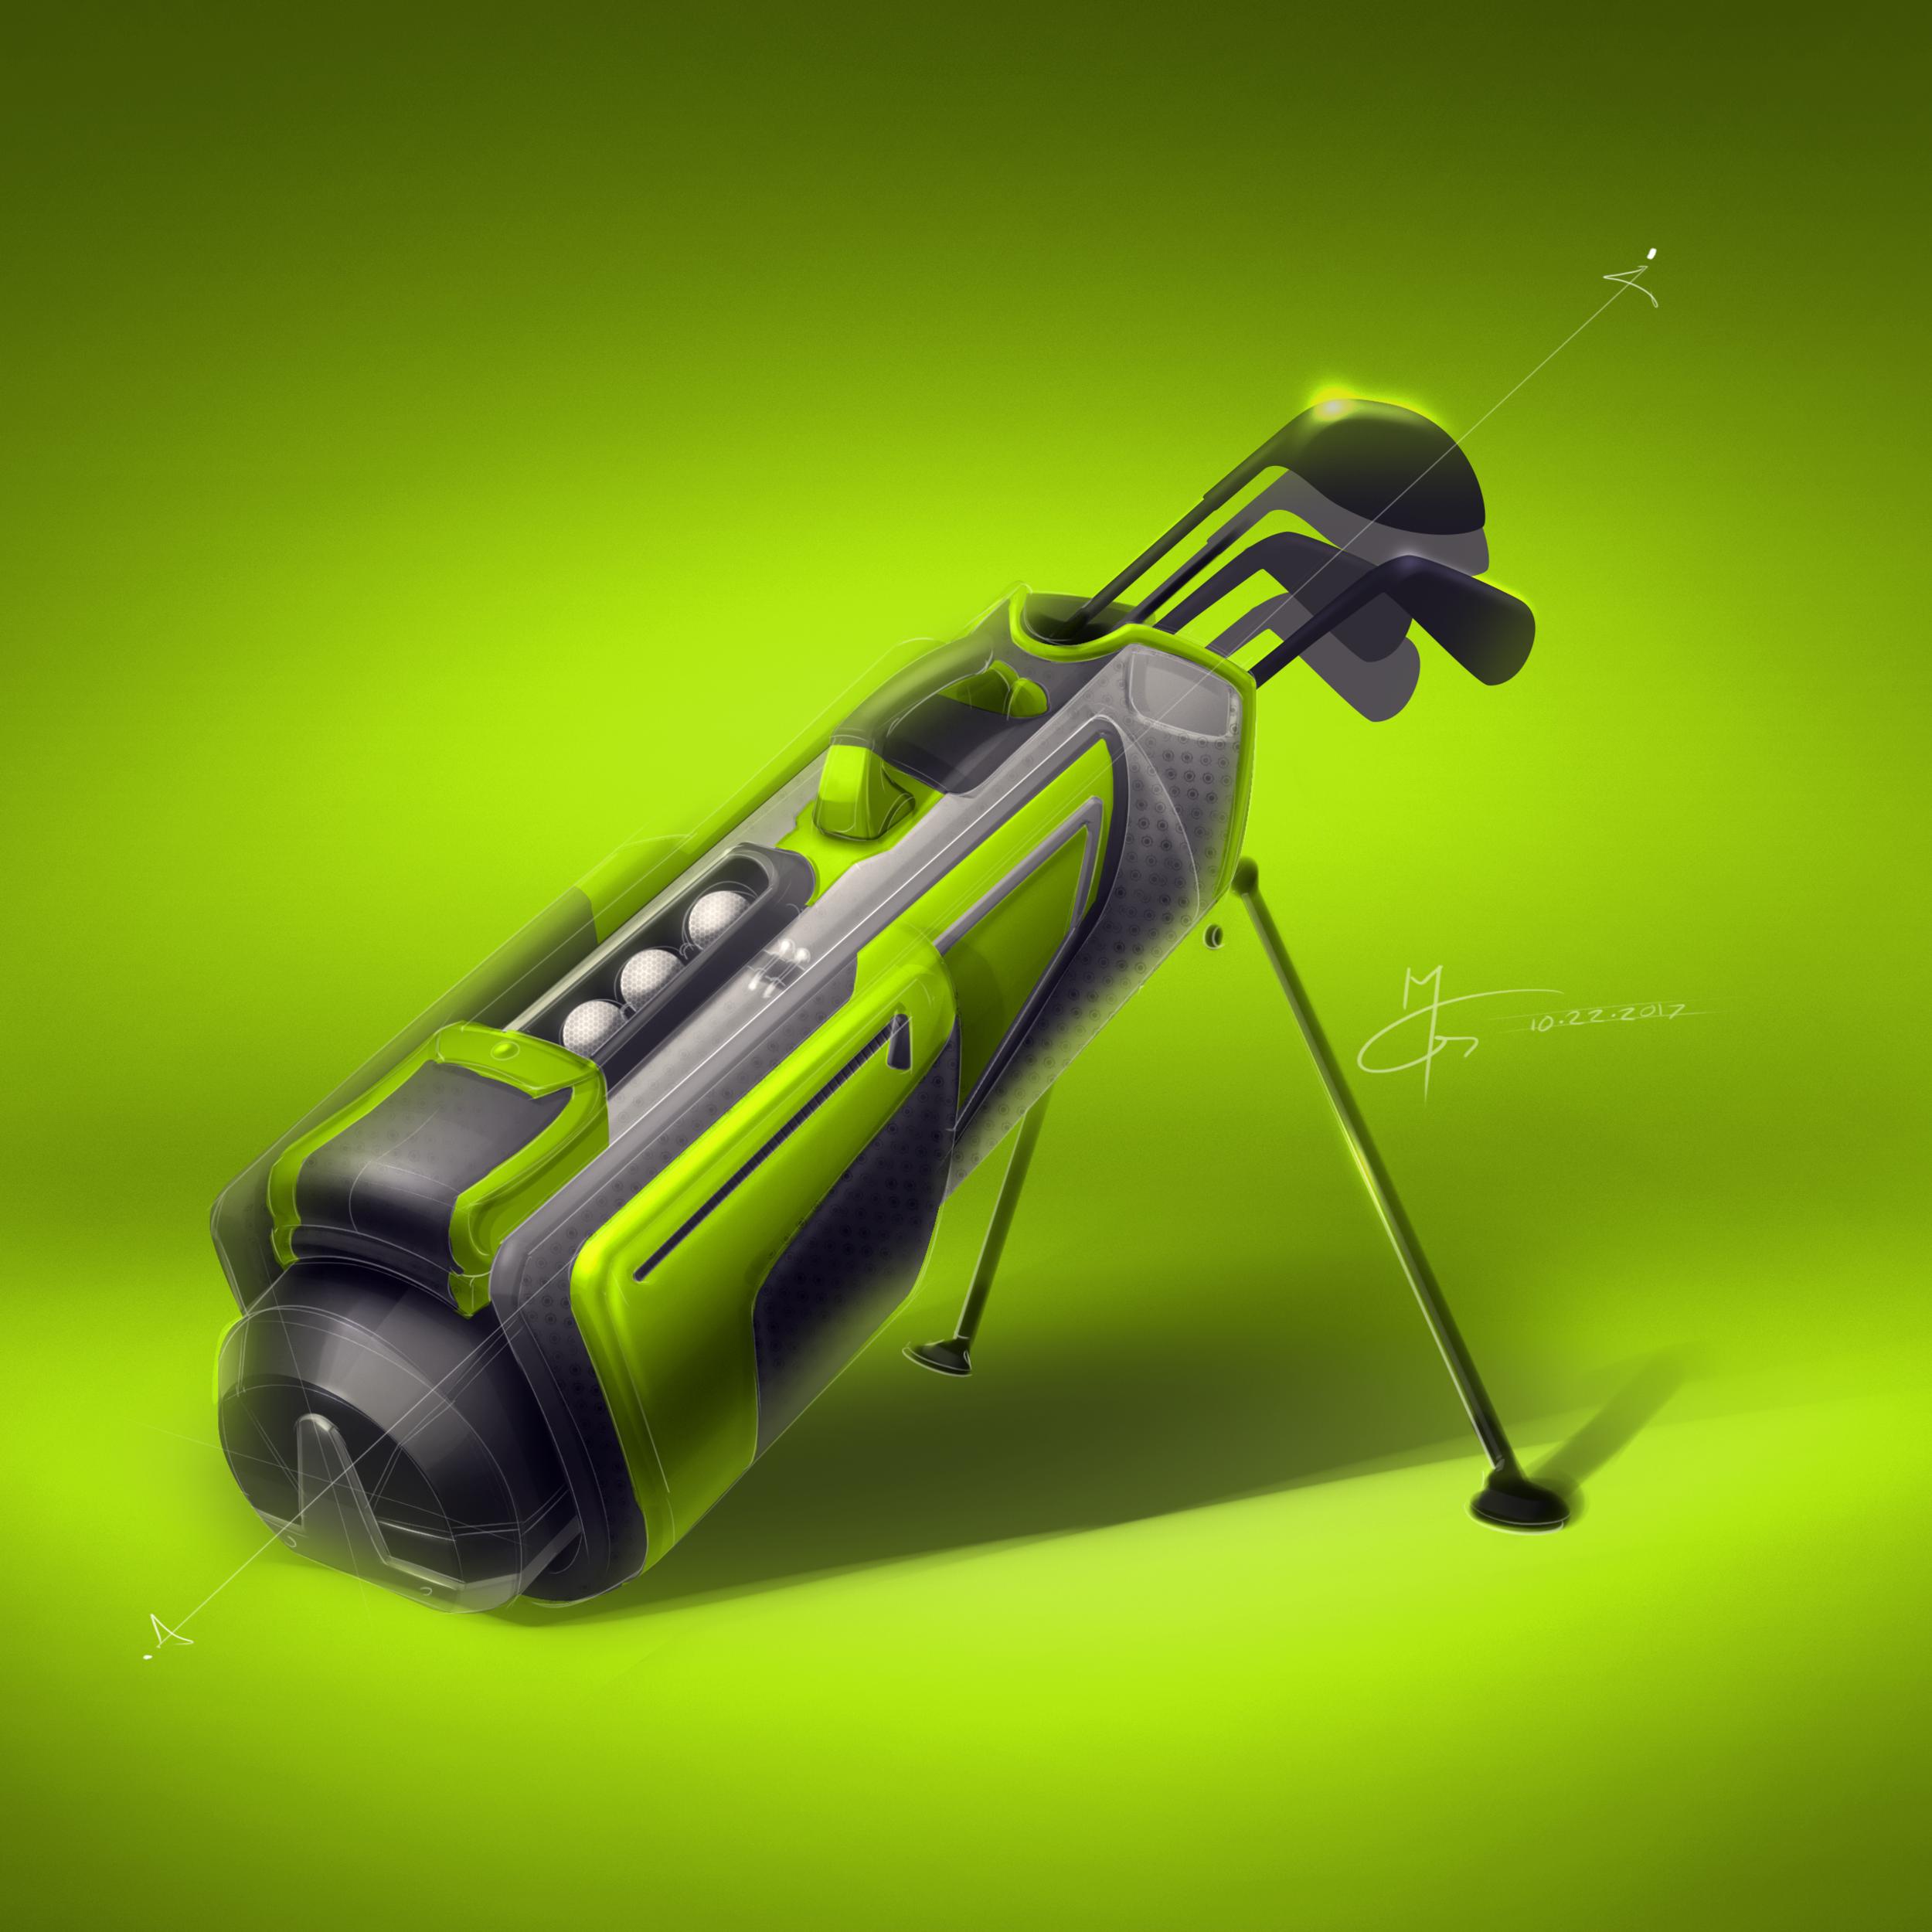 Golf_Bag.png